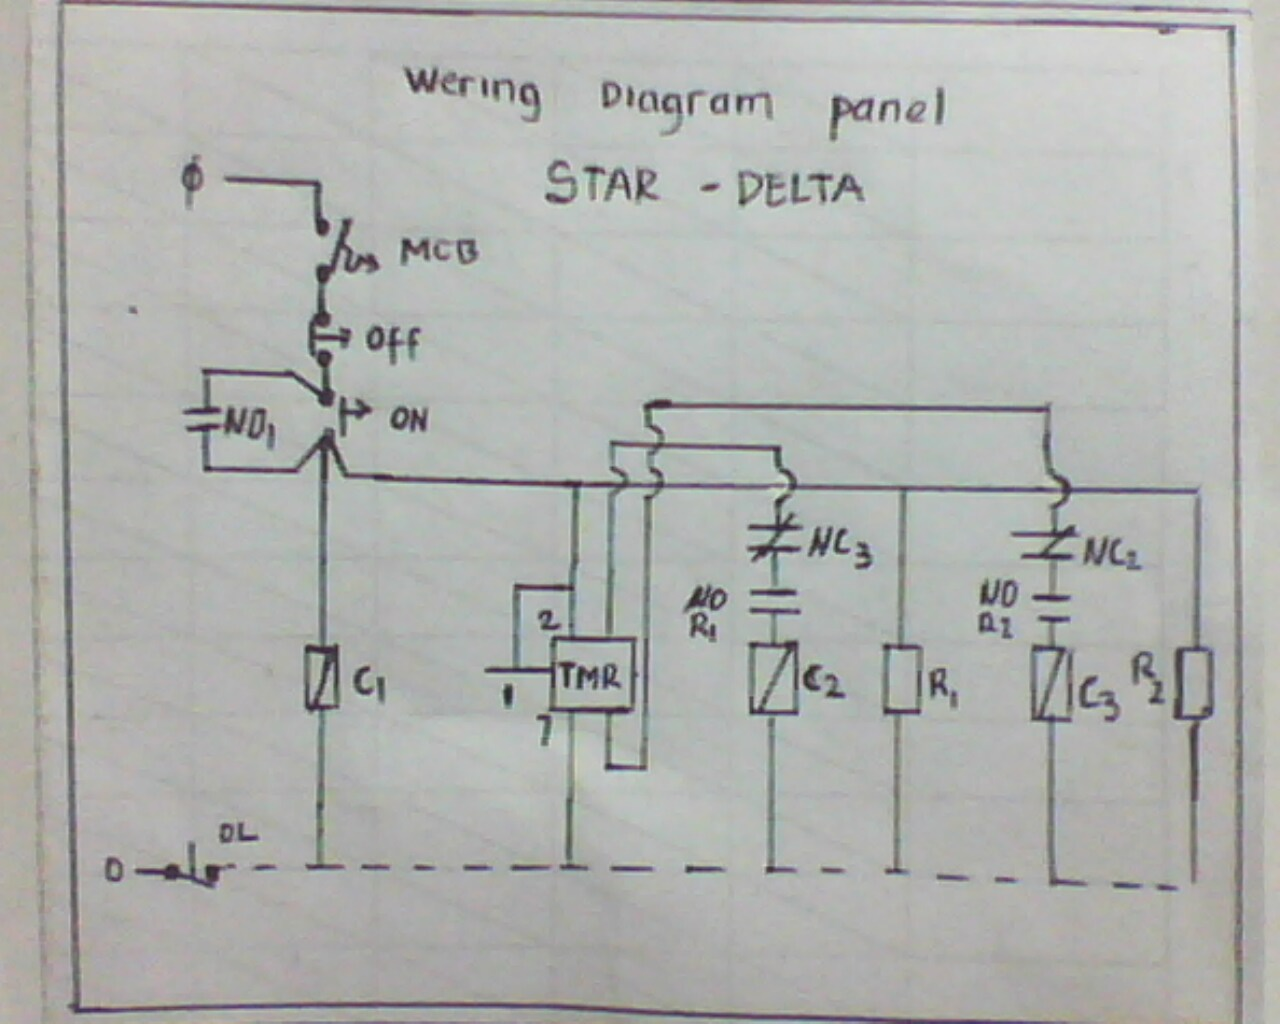 Wiring diagram star delta auto manual free download wiring diagram free download wiring diagram instalasi panel listrik star delta of wiring diagram star delta auto asfbconference2016 Gallery